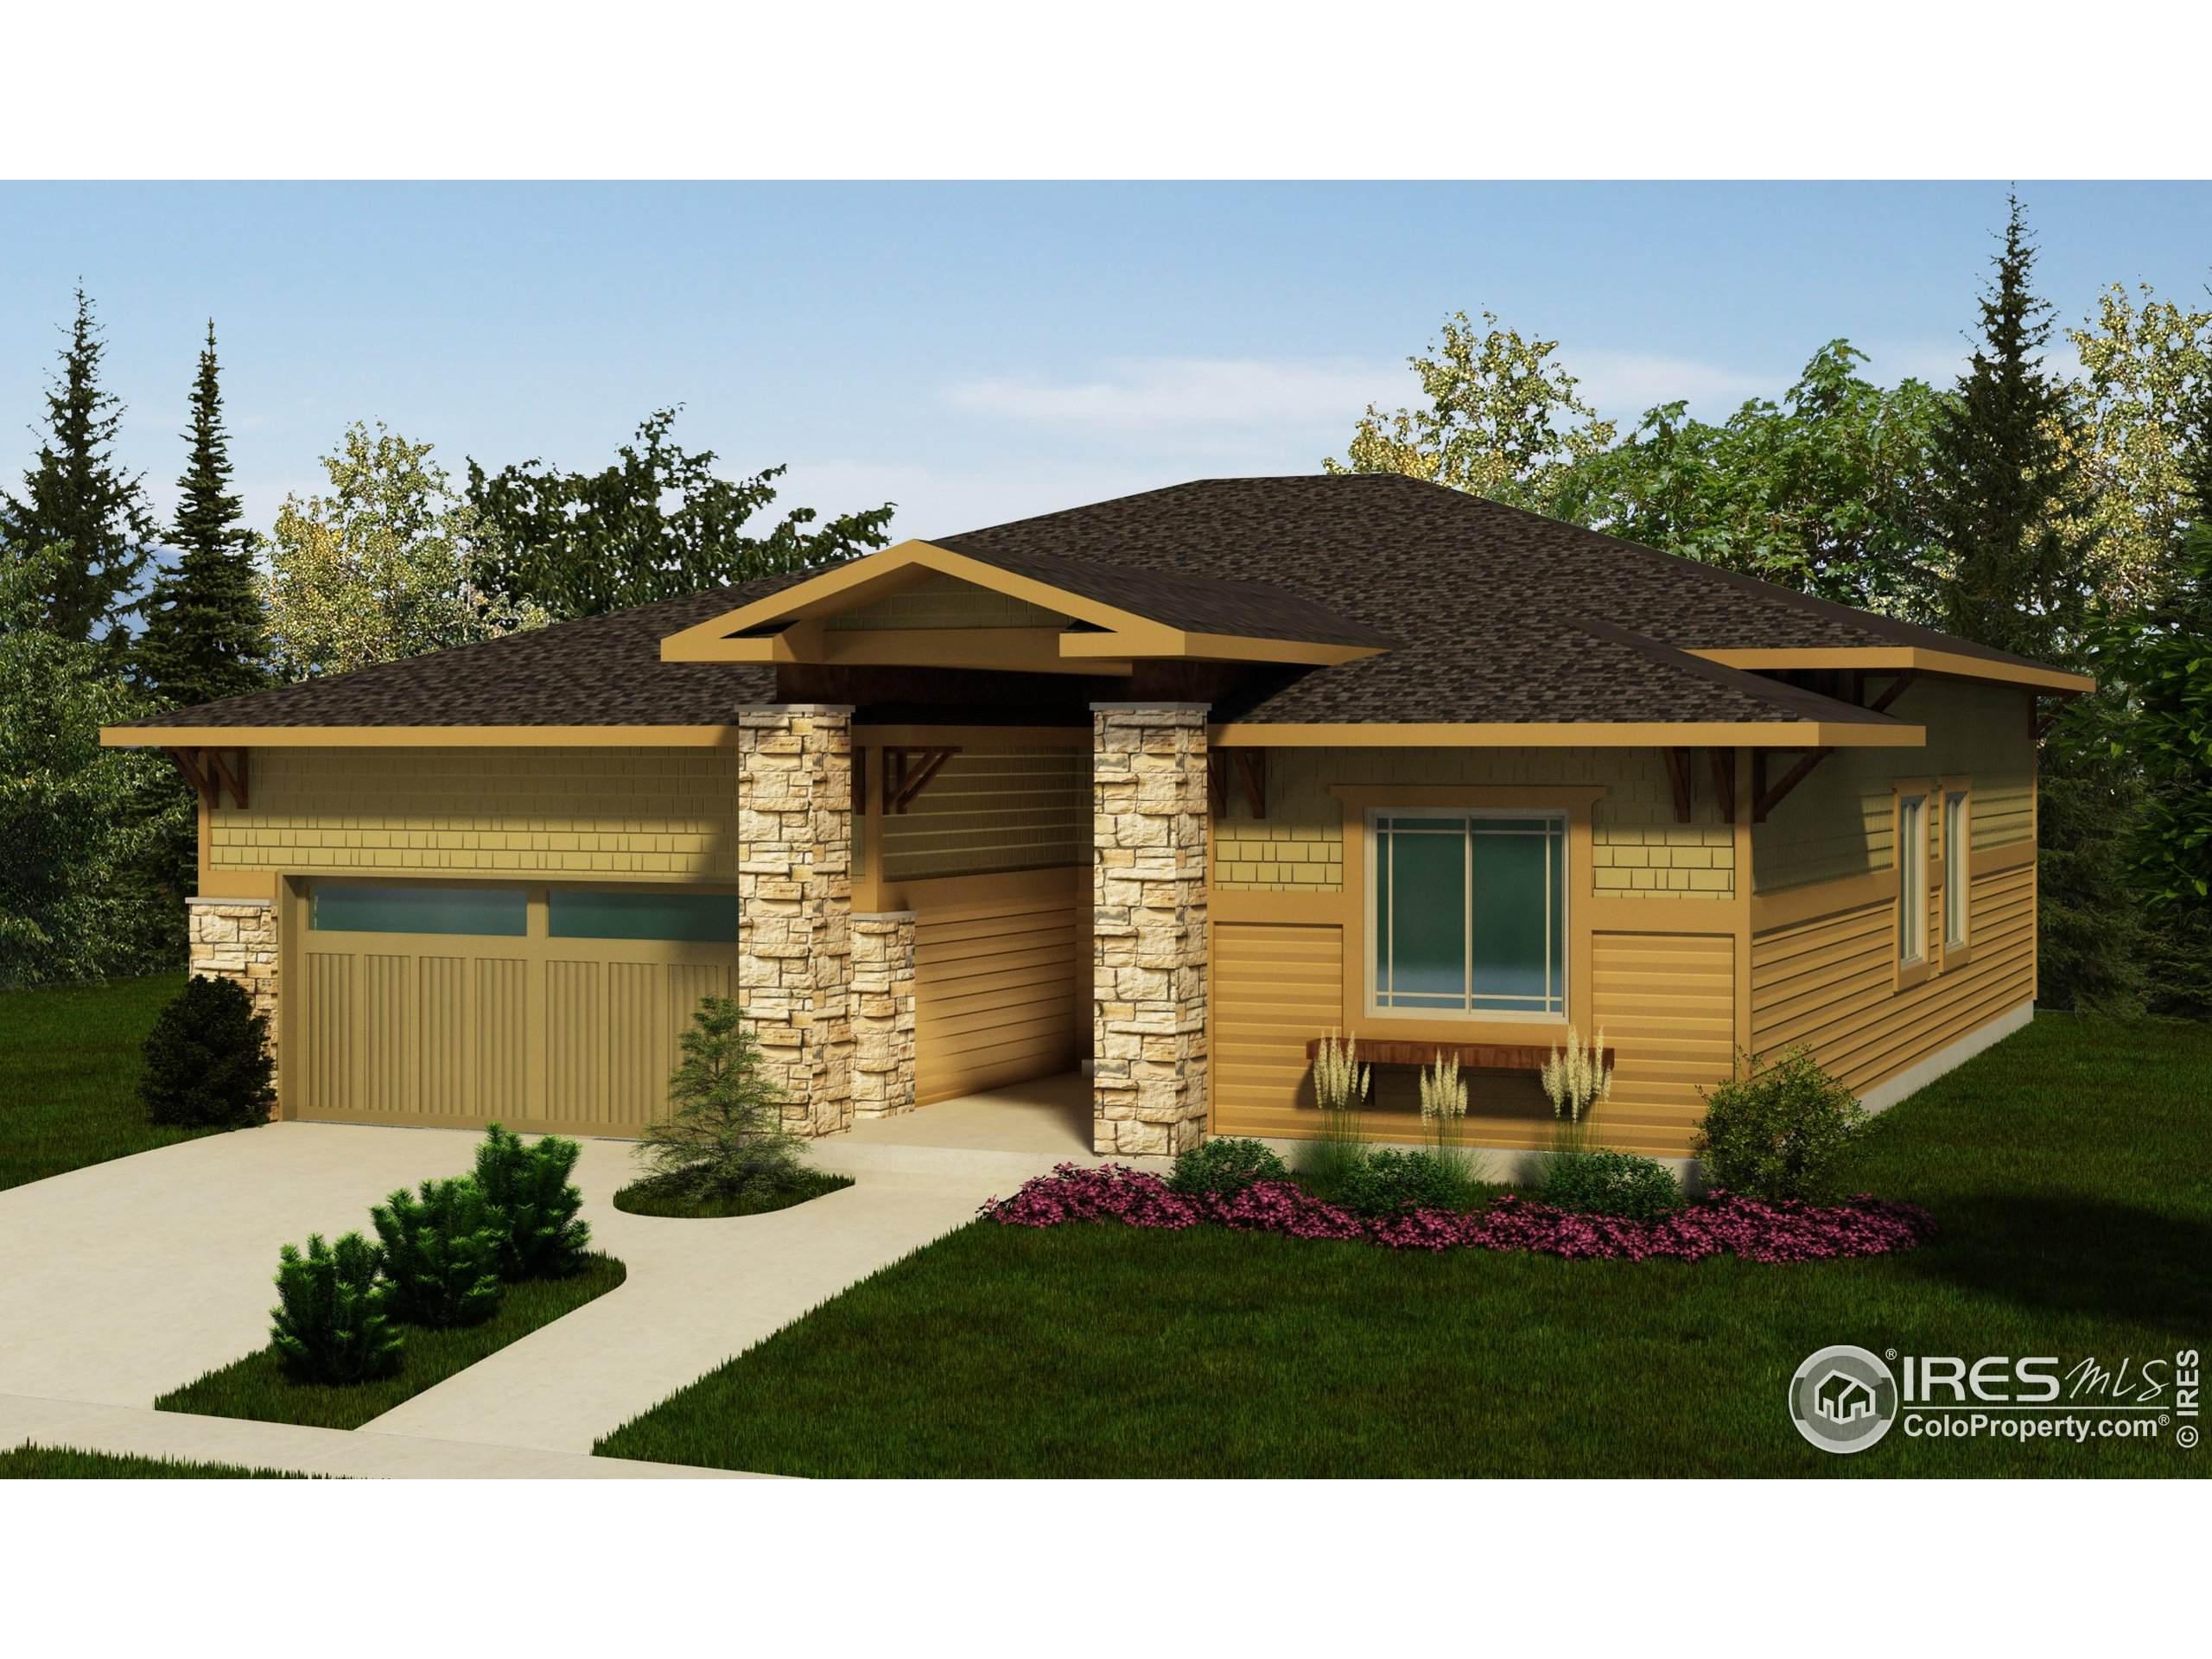 2324 Saddle Notch Rd, Loveland, CO 80537 (MLS #941101) :: Coldwell Banker Plains